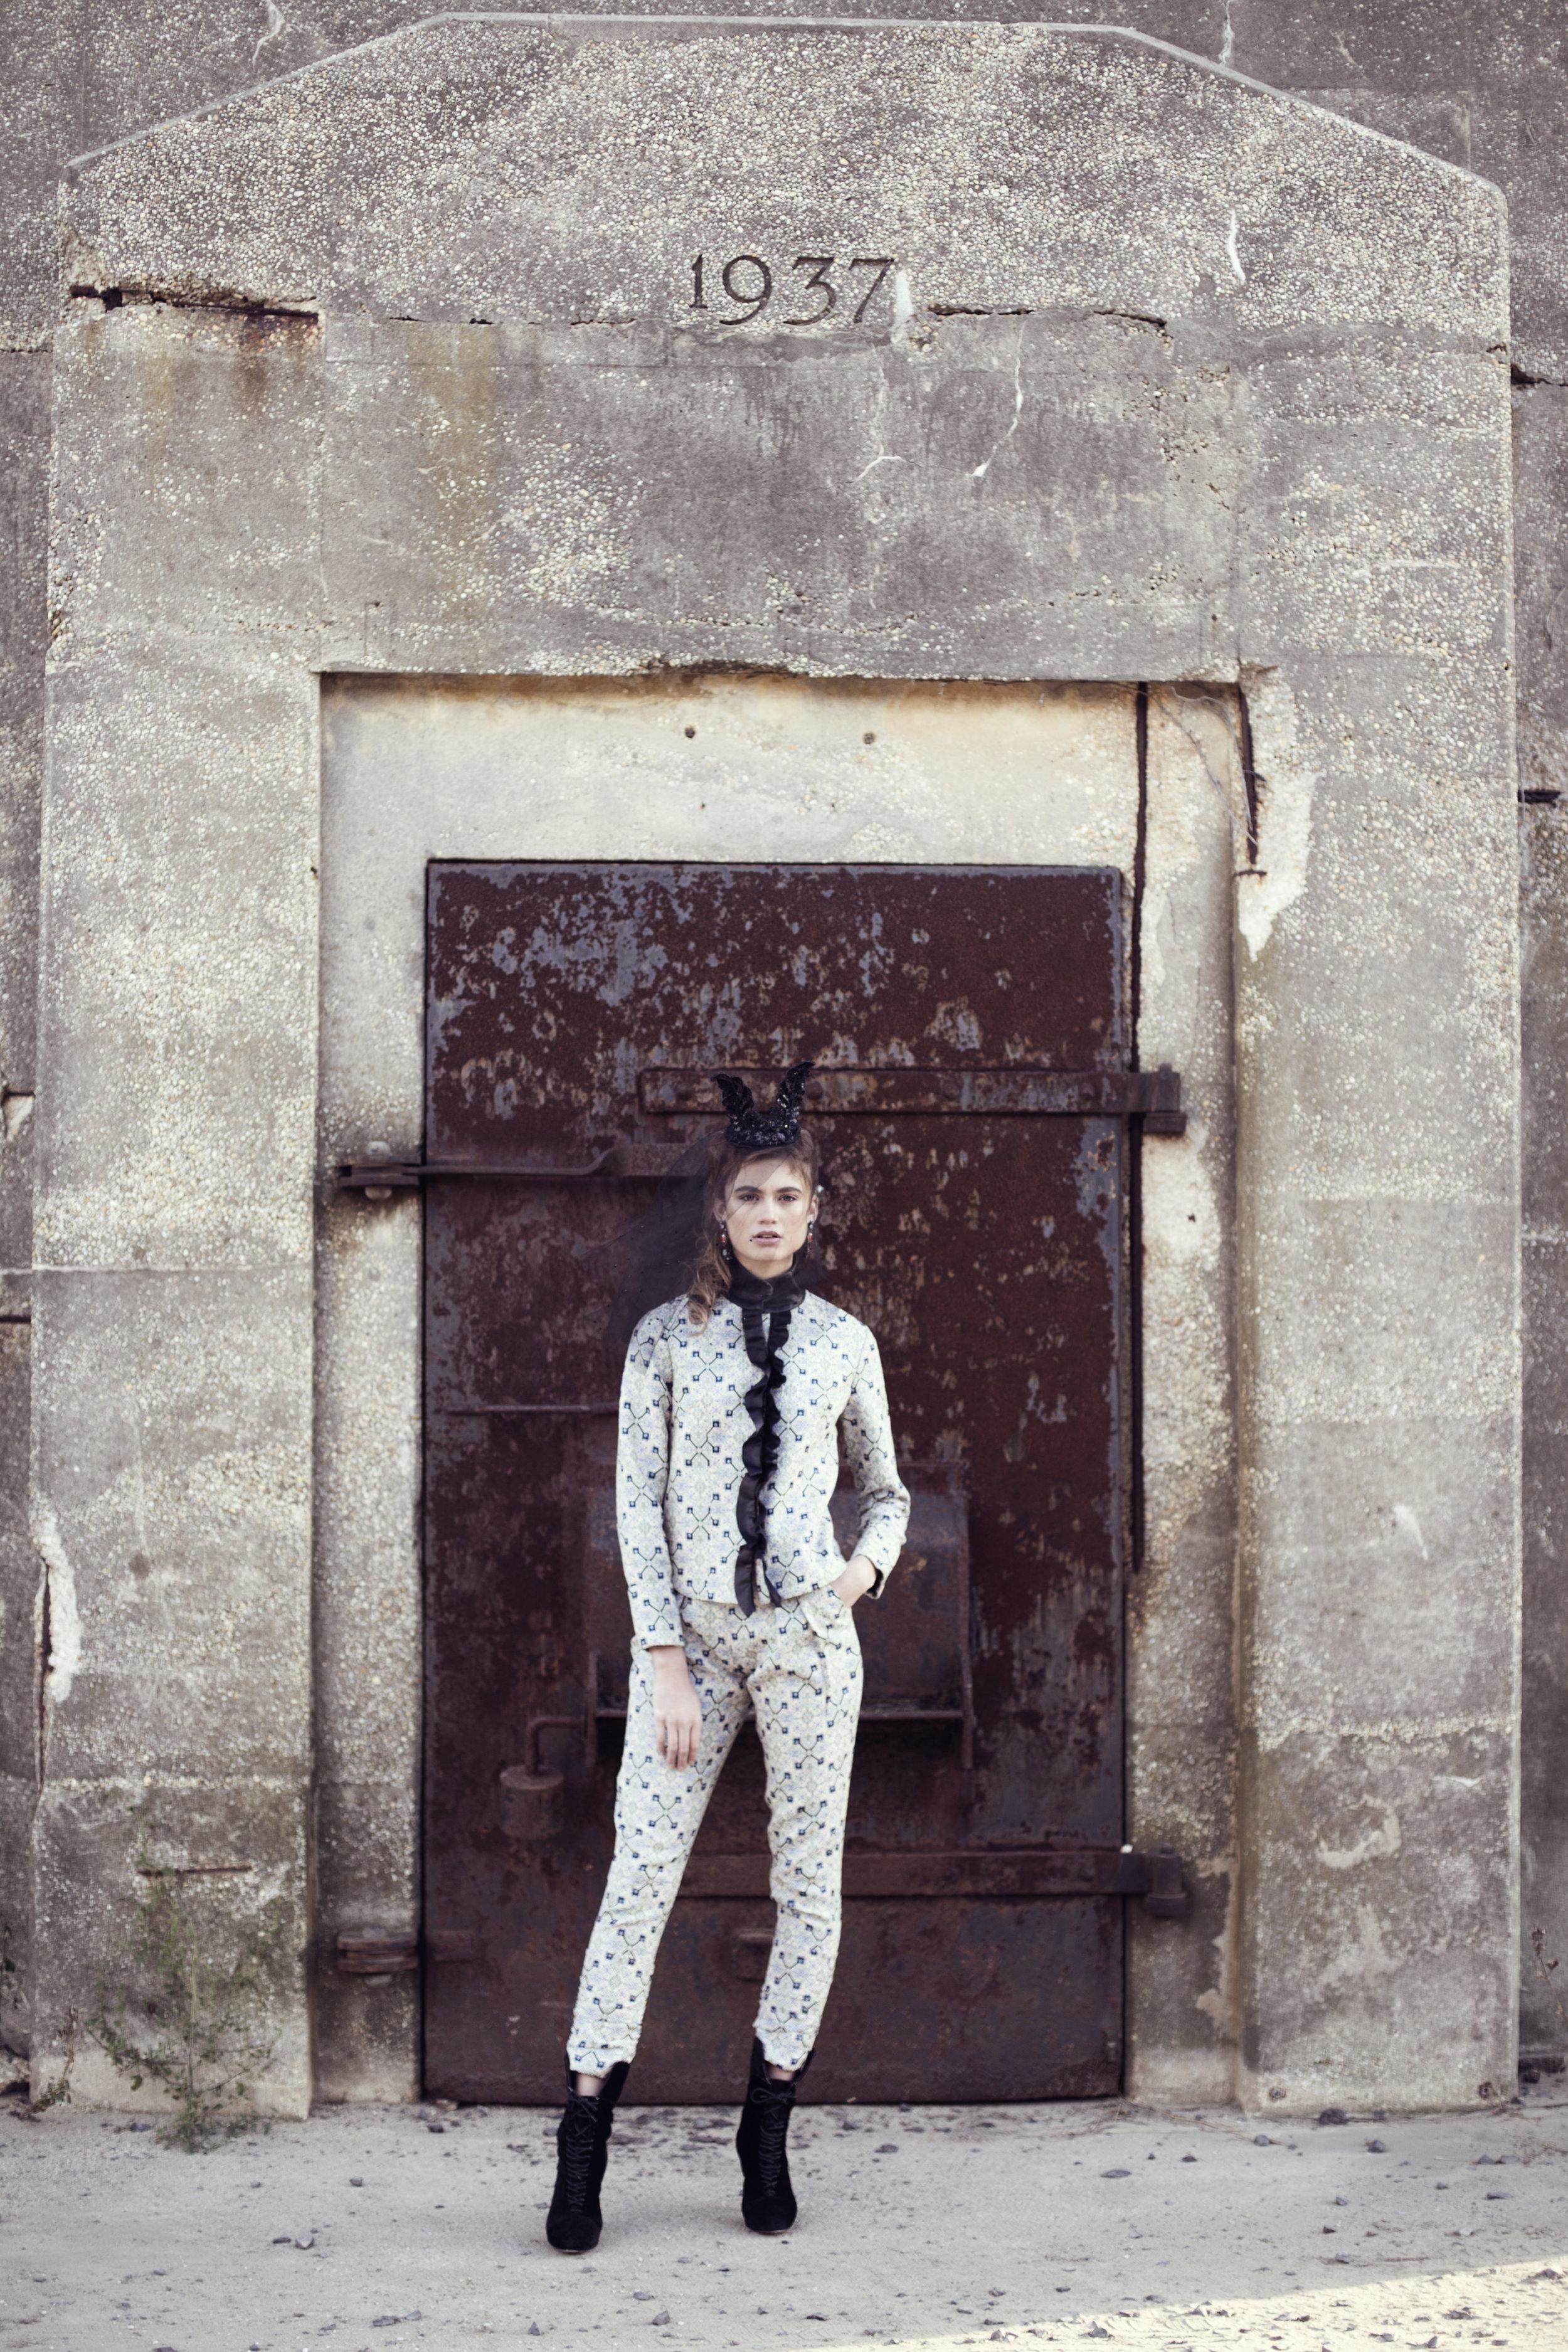 Co-ord: Vivienne Hu, Veil: Veritée Hill, Earrings: Deepa Gurmani, Shoes: Charlotte Ronson